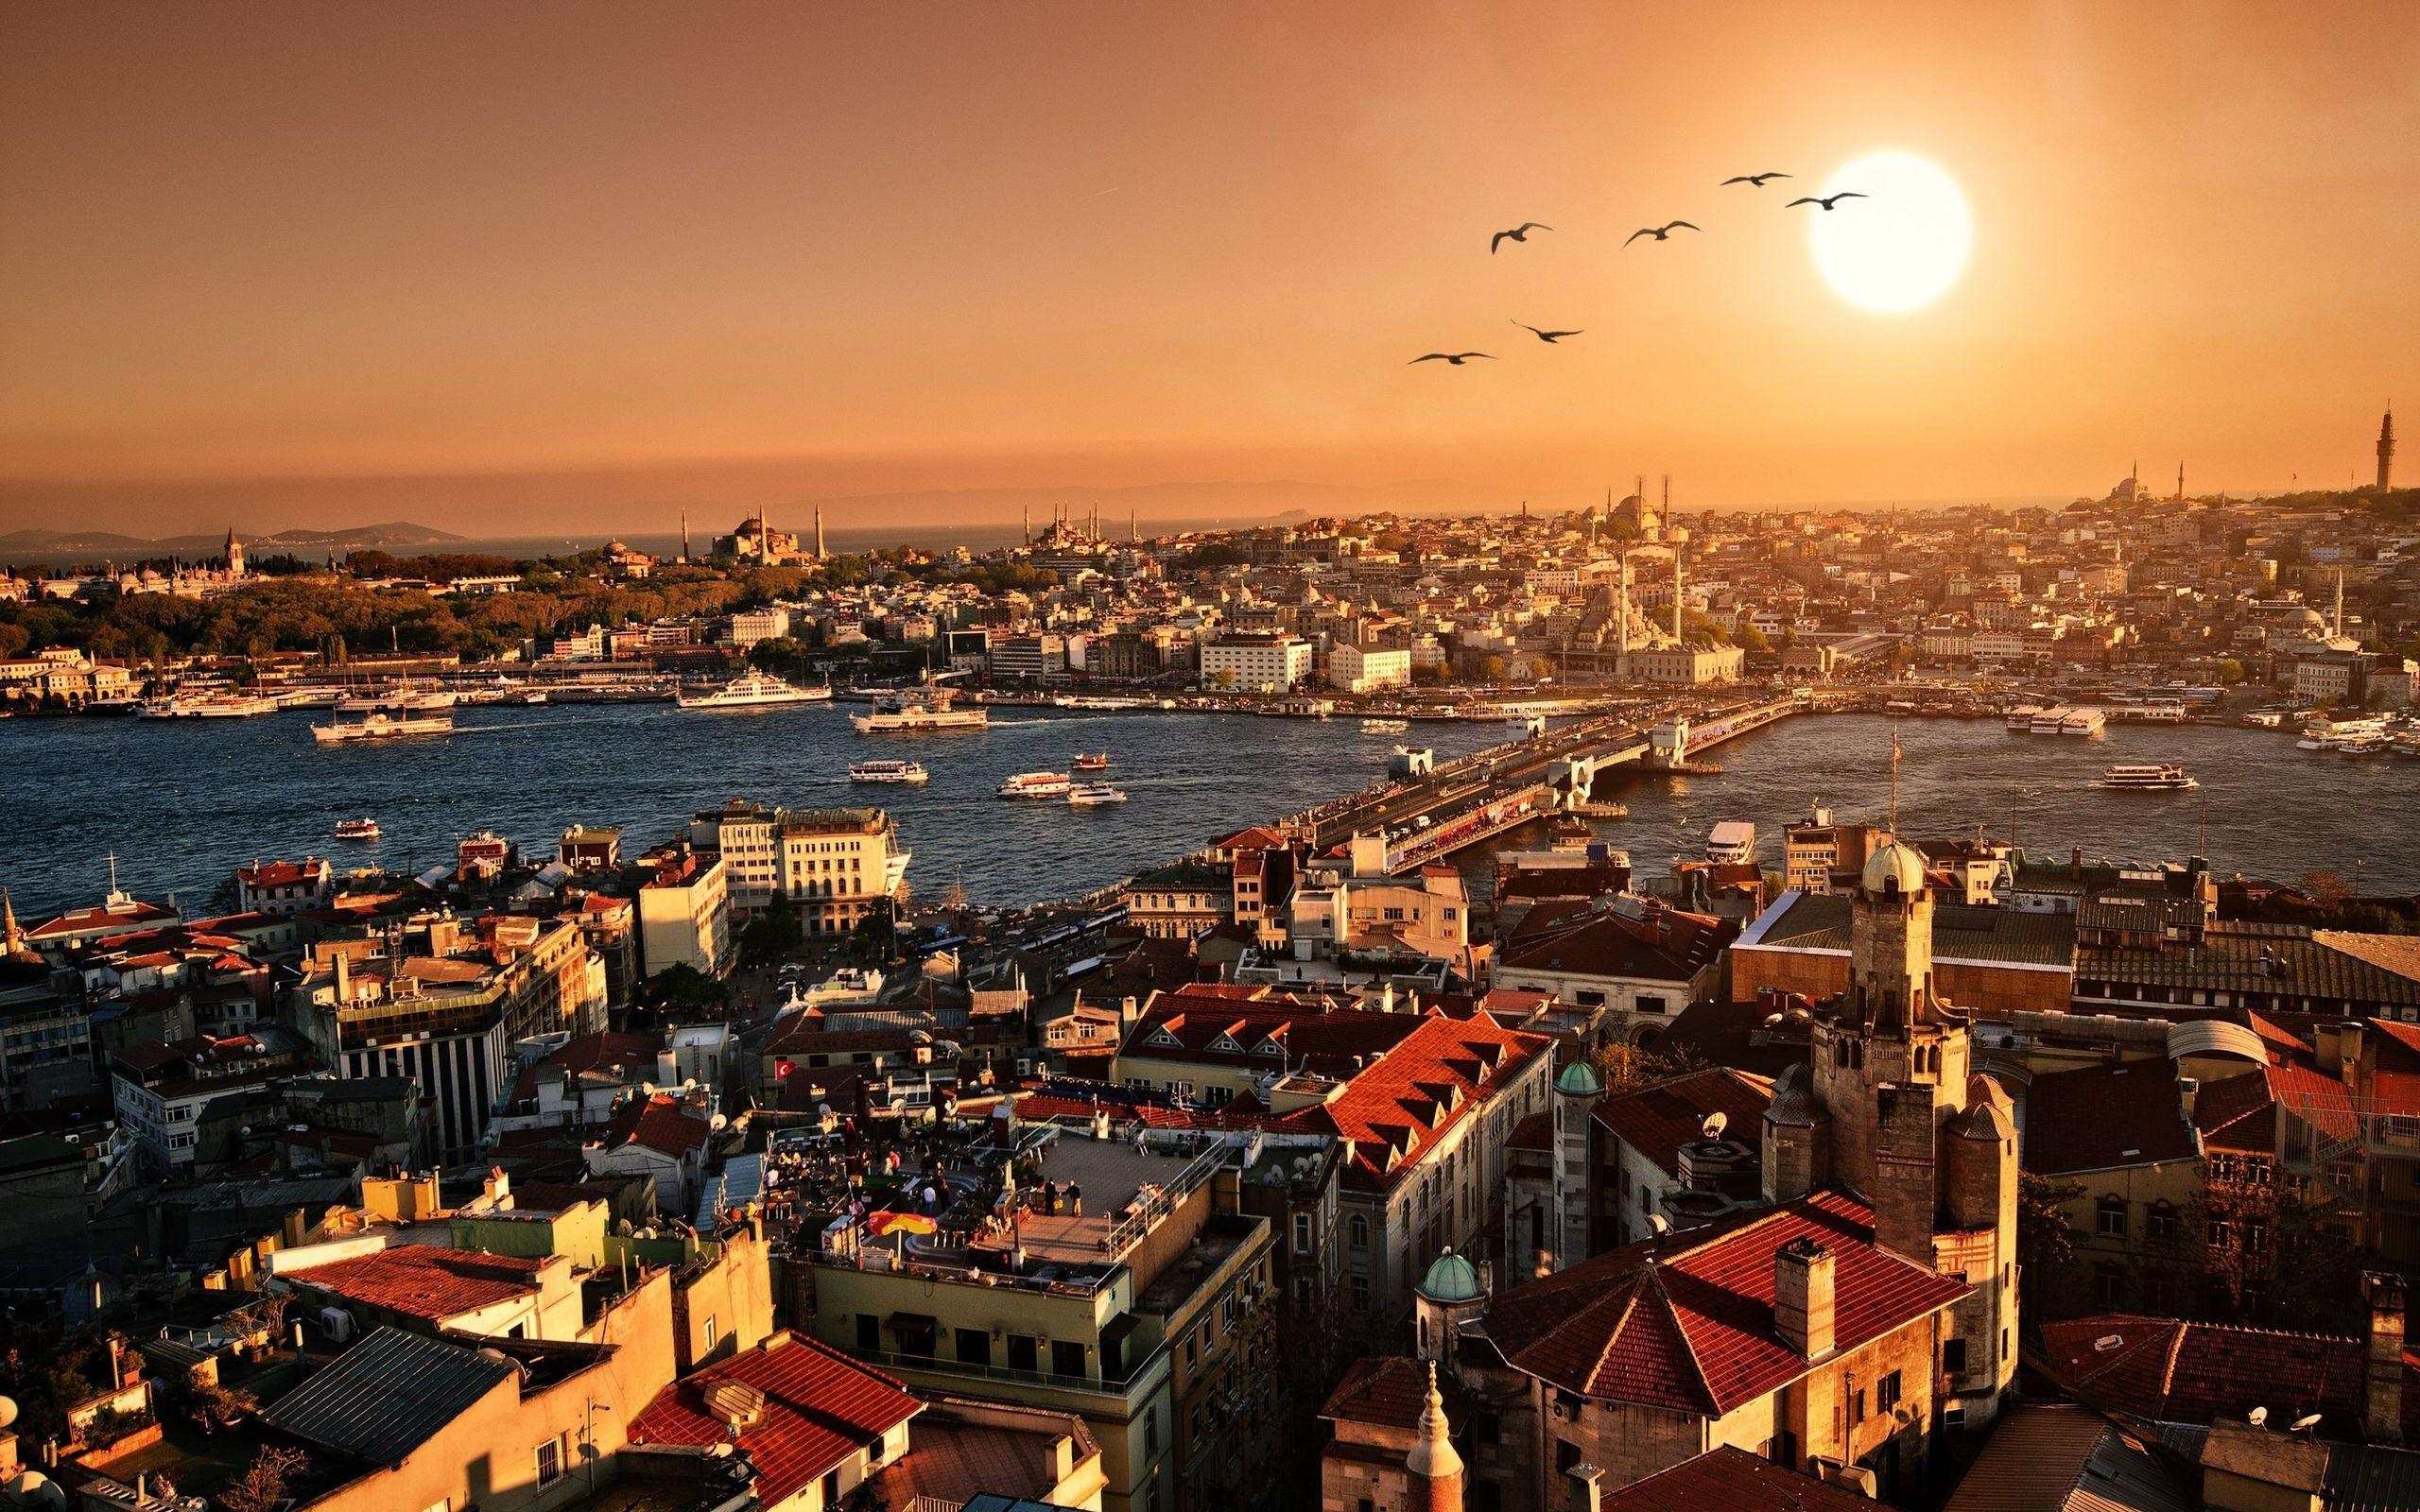 картинки города стамбул хоть